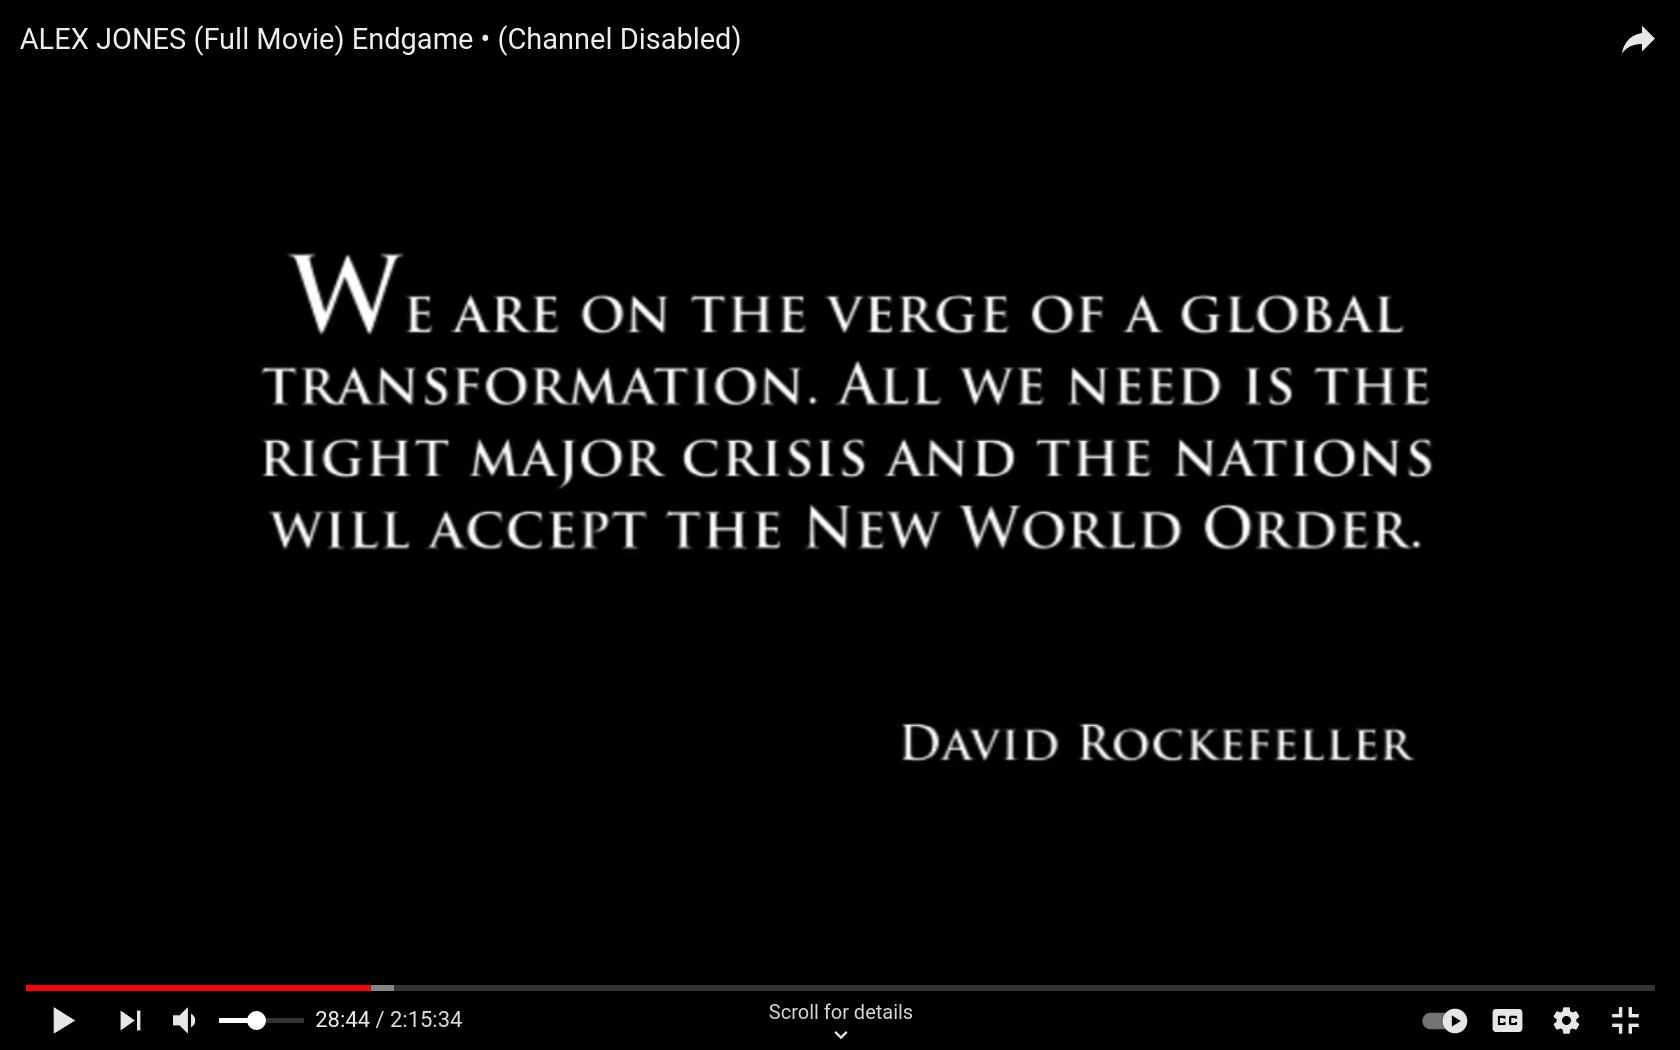 Screenshot at 2020-12-25 01:18:11 New World Order Needs the Right Crisis or PANDEMIC to Begin says David Rockefeller.png